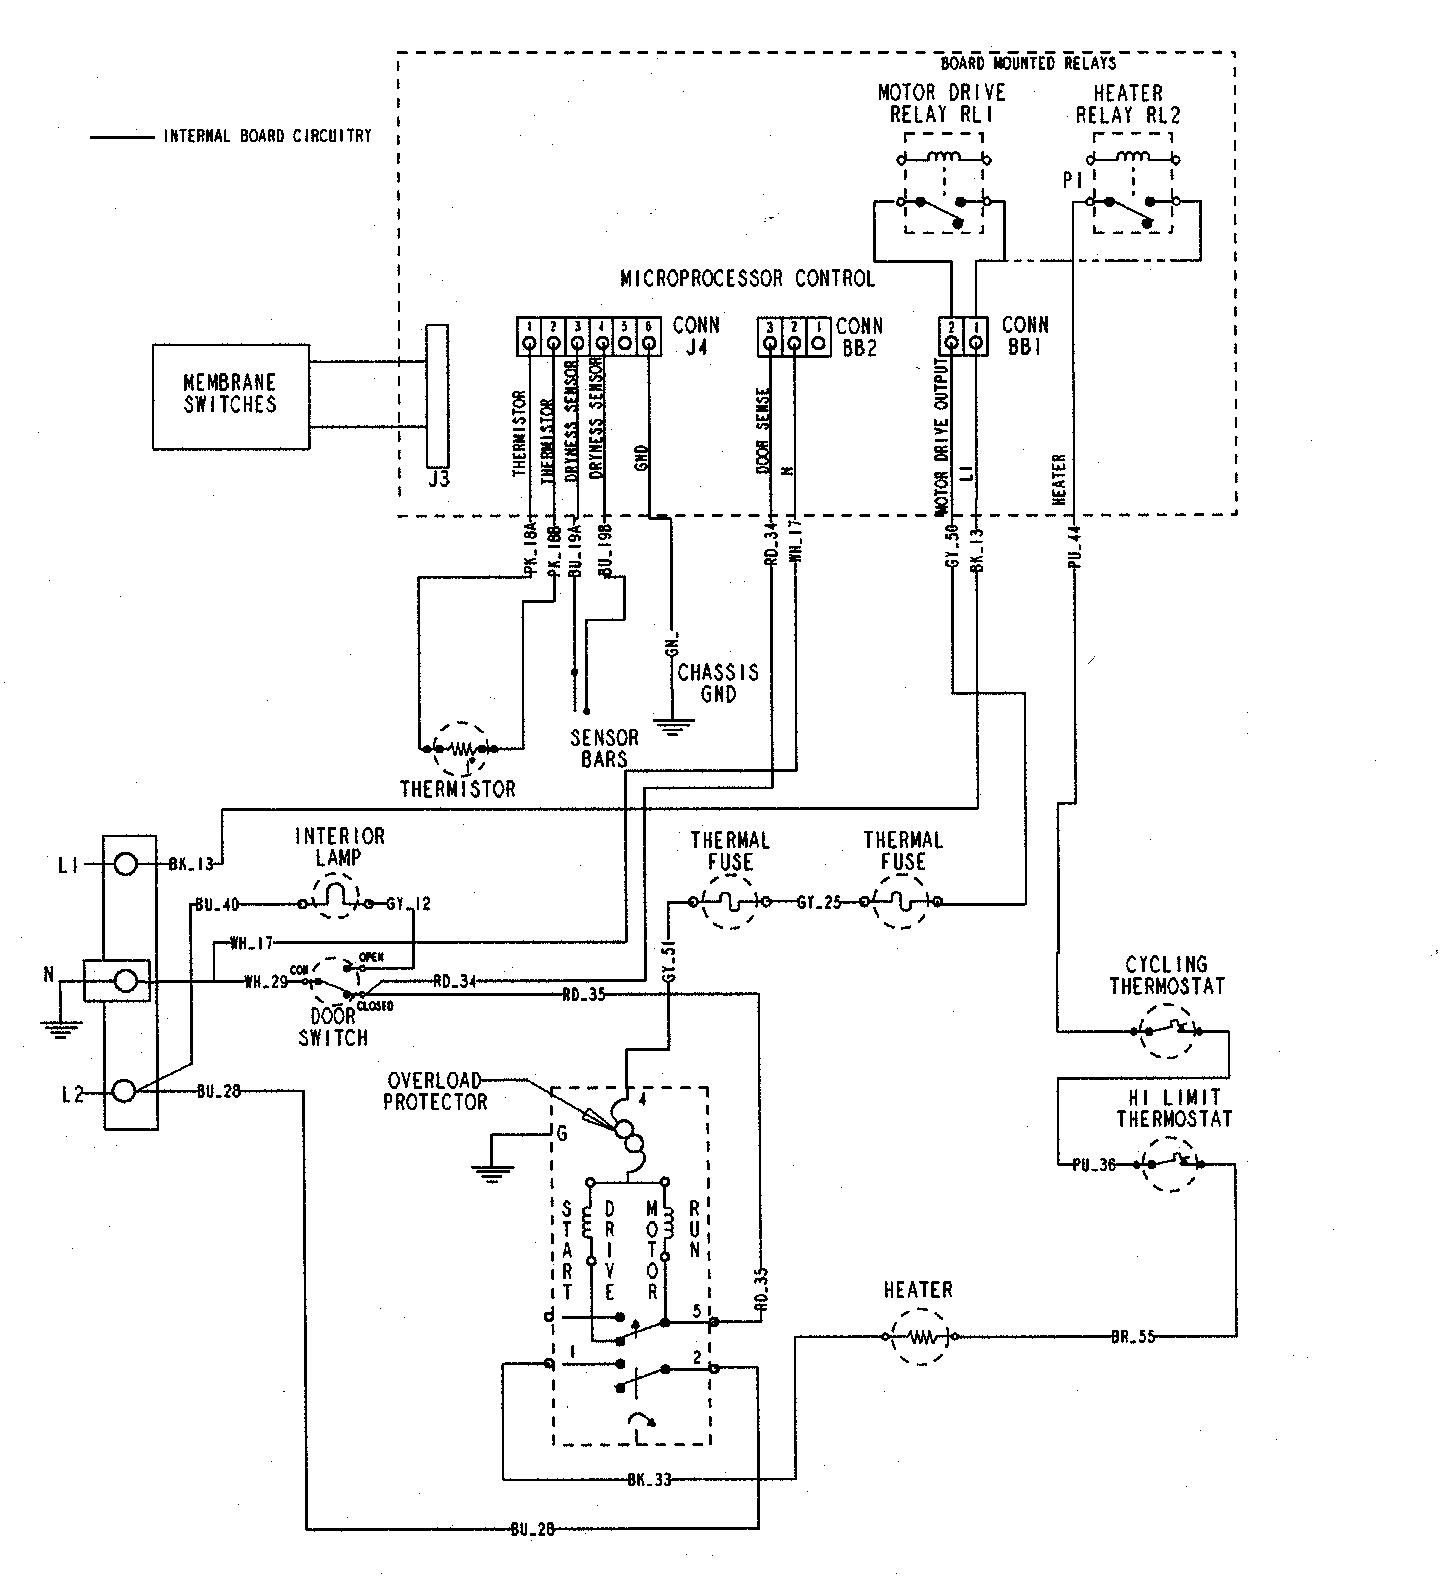 hight resolution of maytag mde5500ayq wiring information diagram